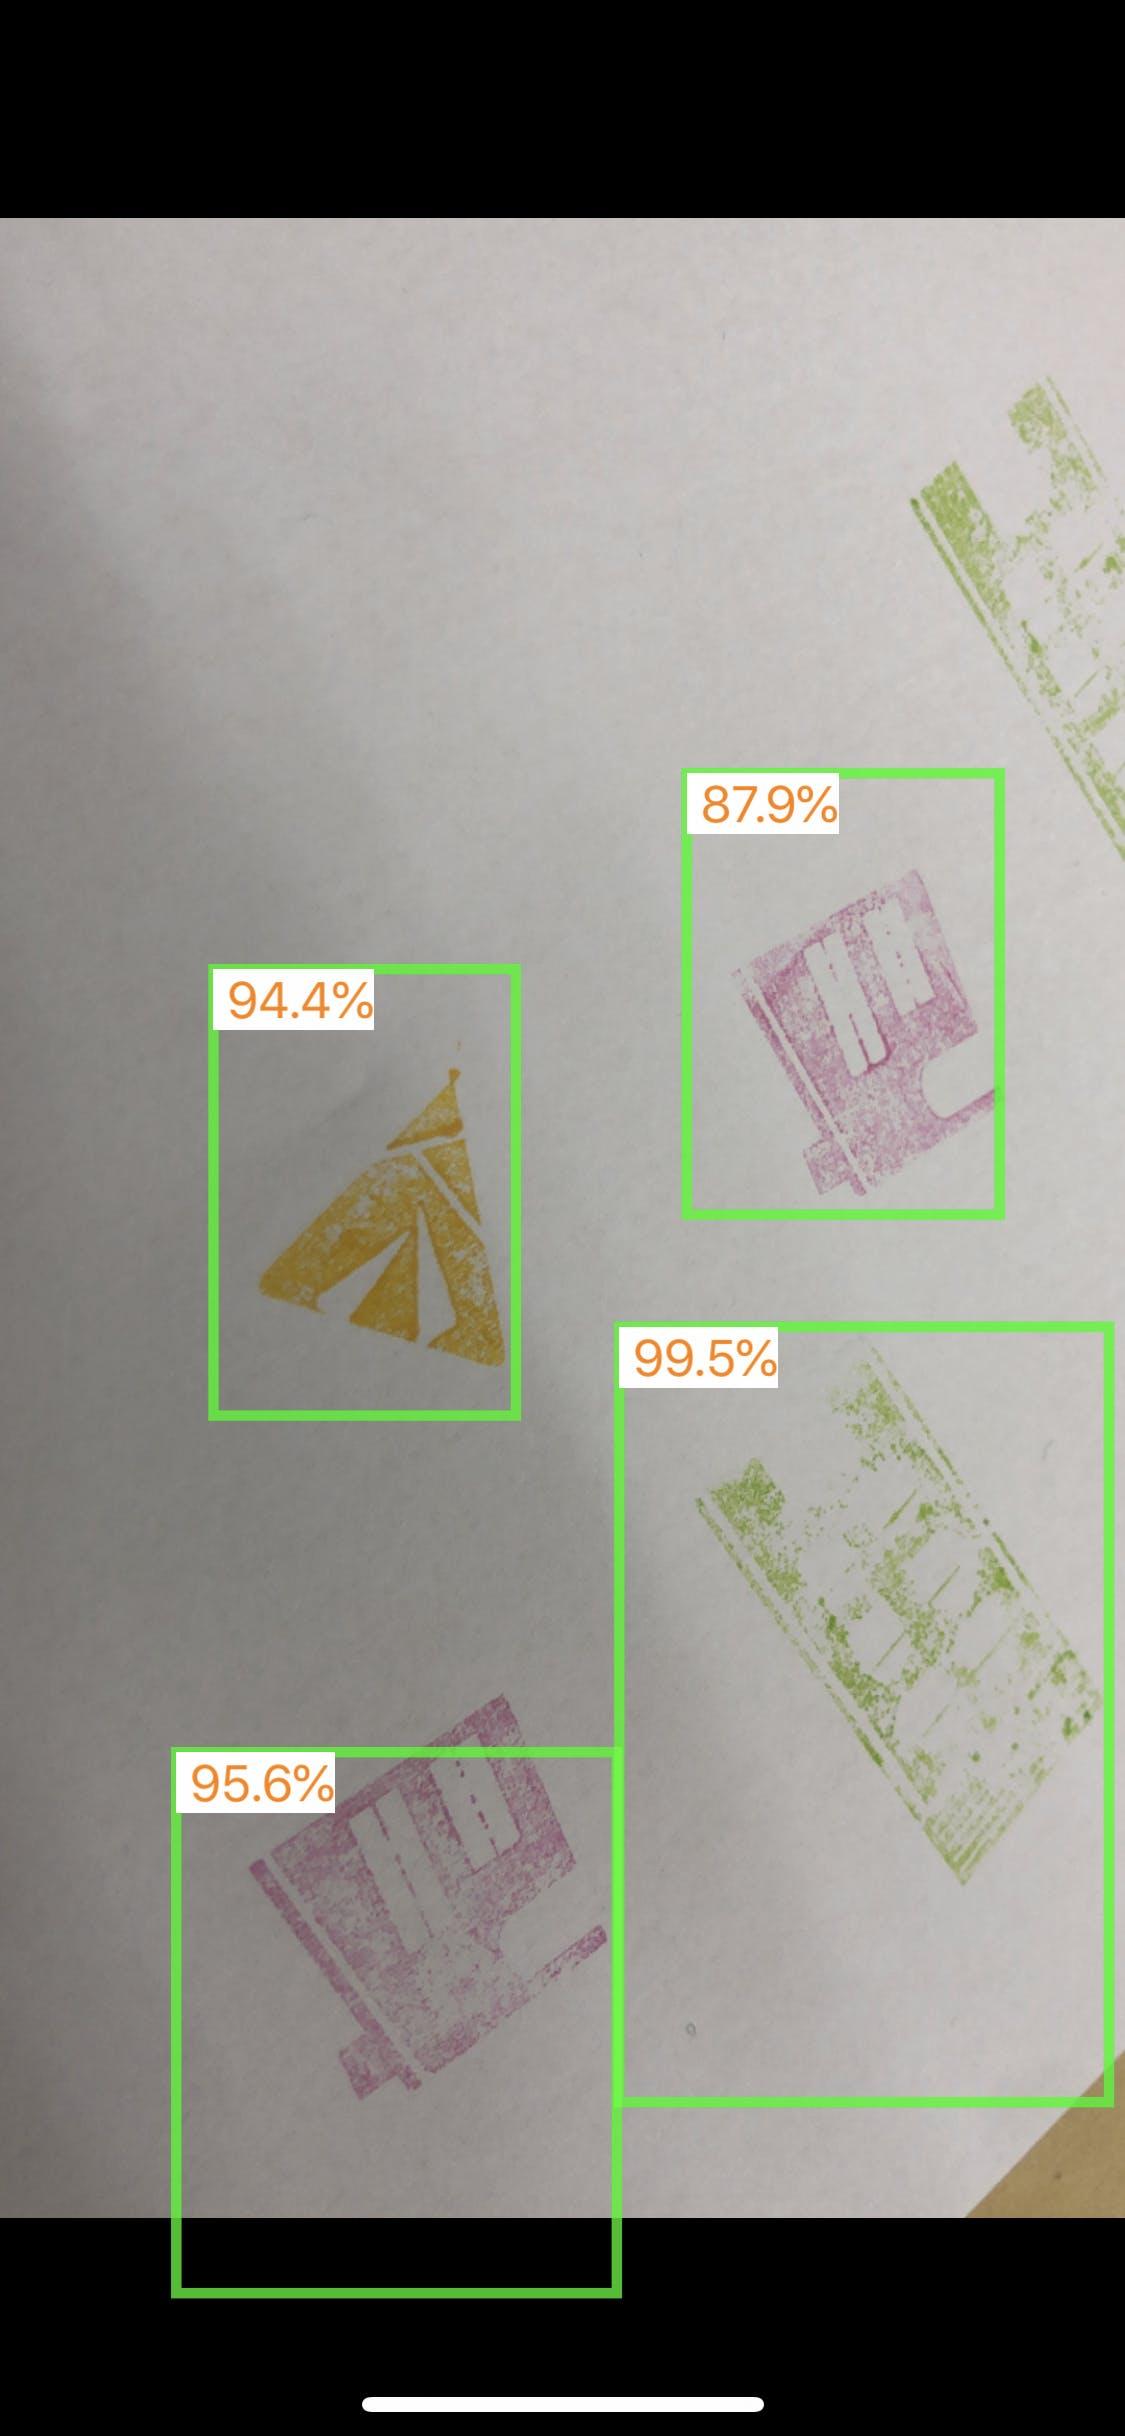 Ios Tensorflow Object Detection